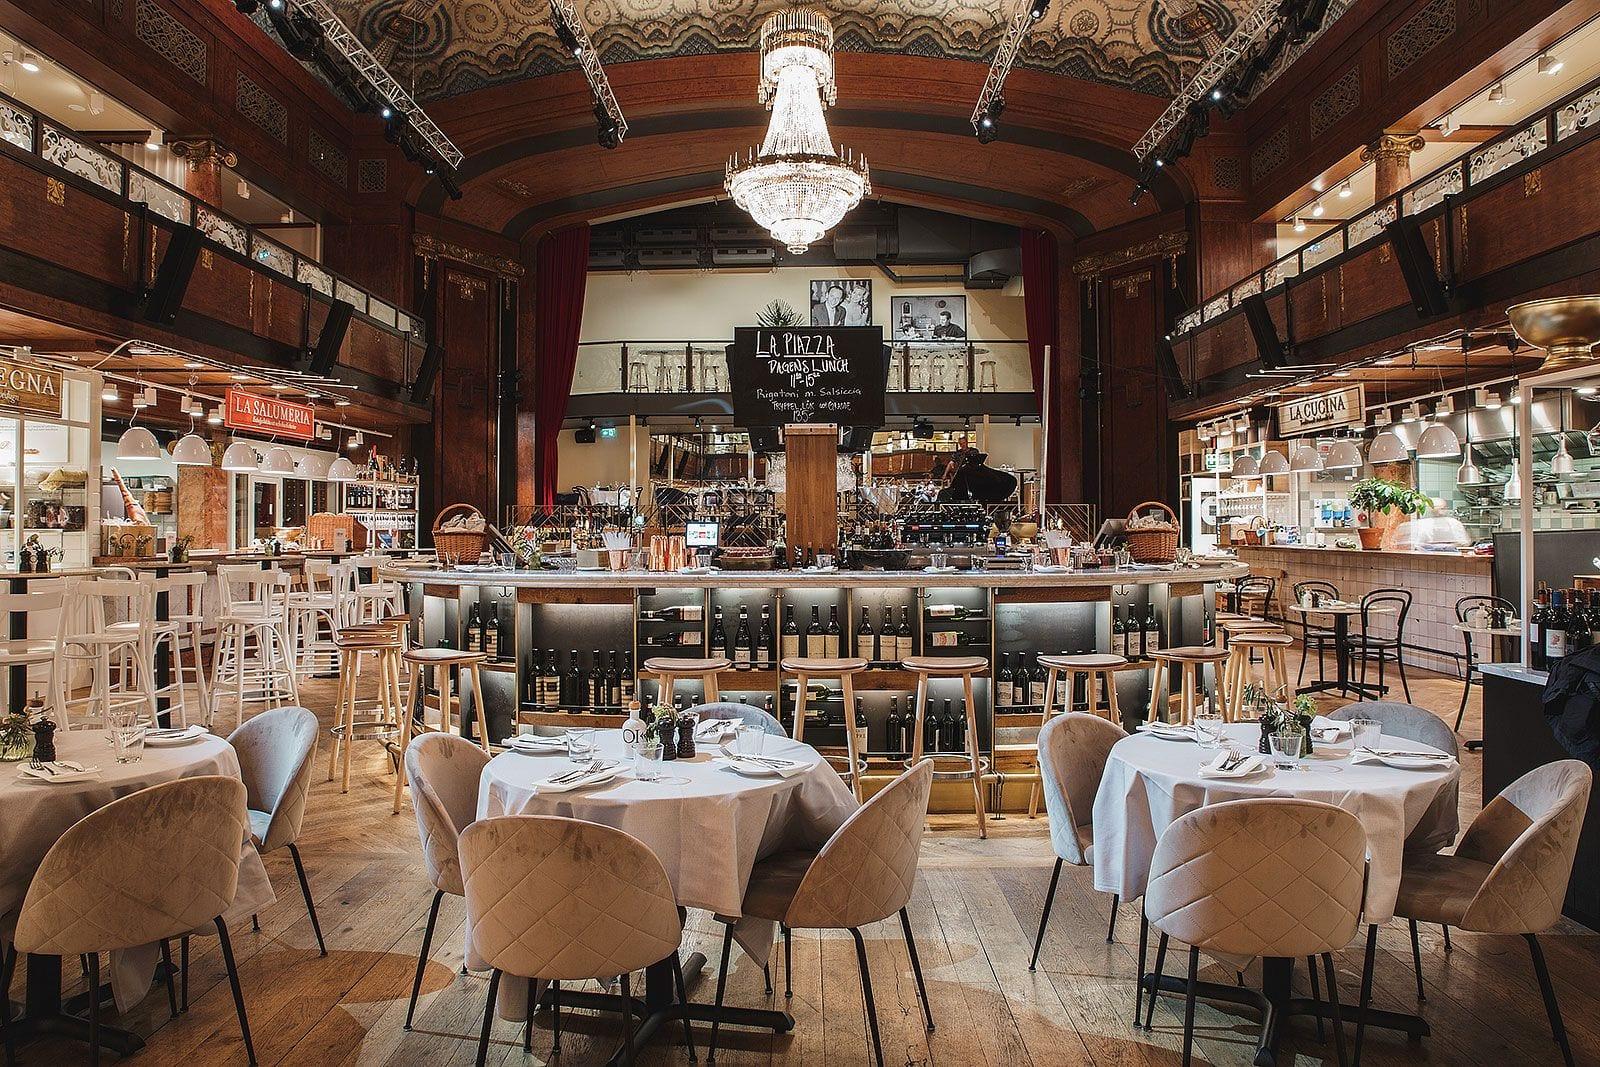 restaurang stockholm tips